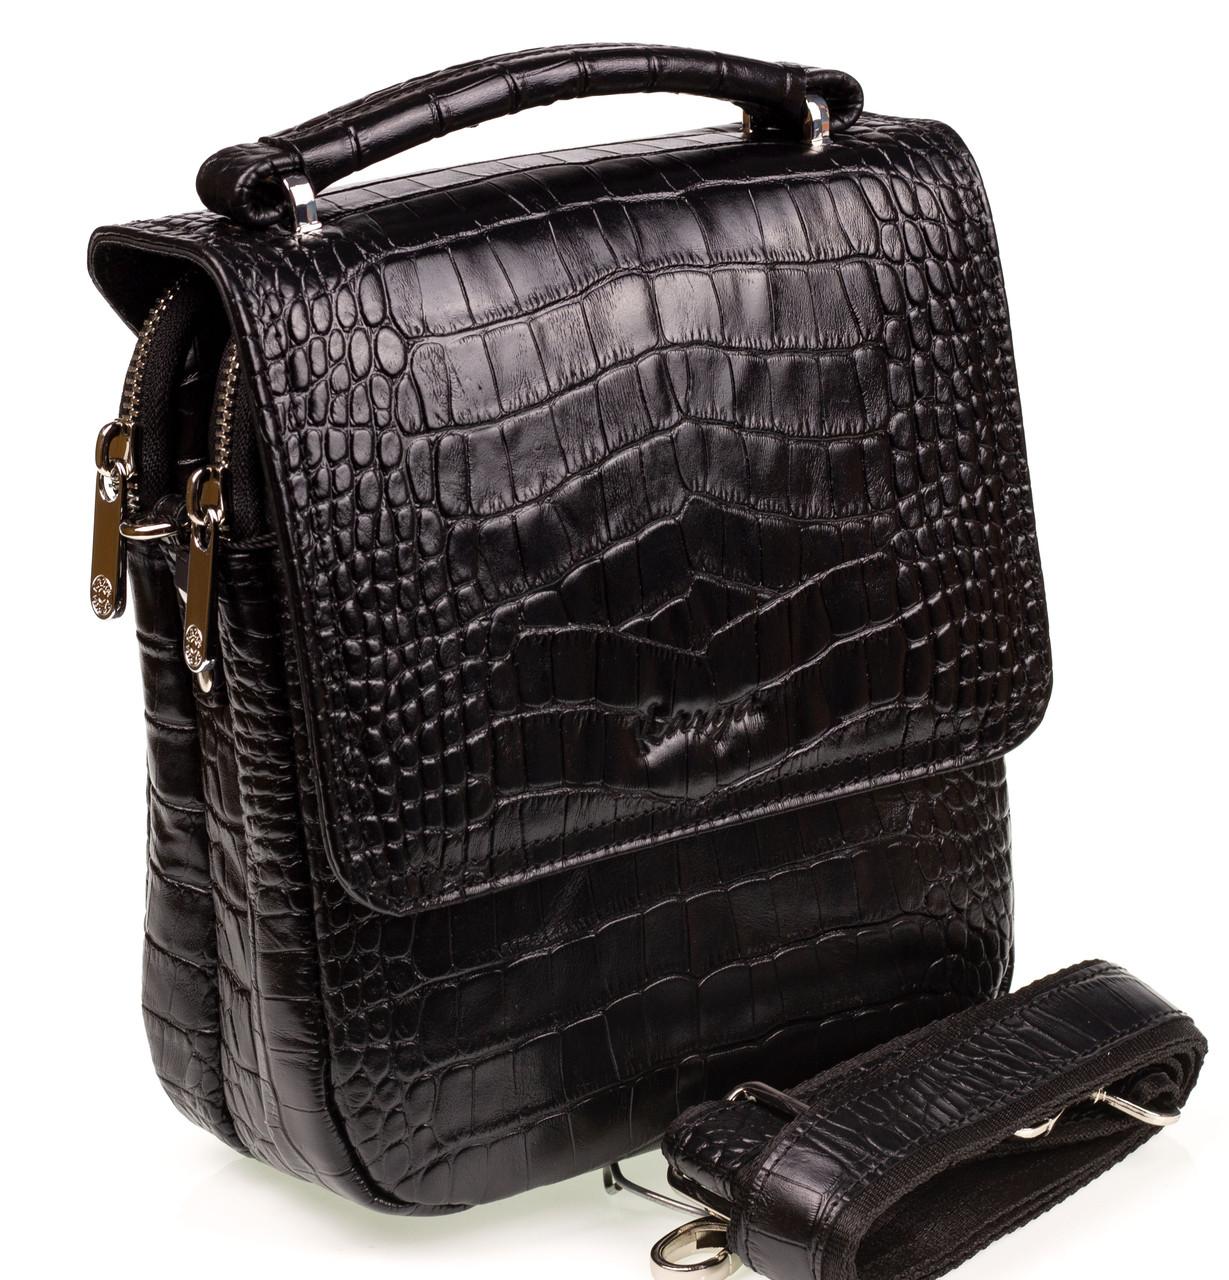 Мужская вертикальная сумка барсетка Karya 0795-53 кожаная черная